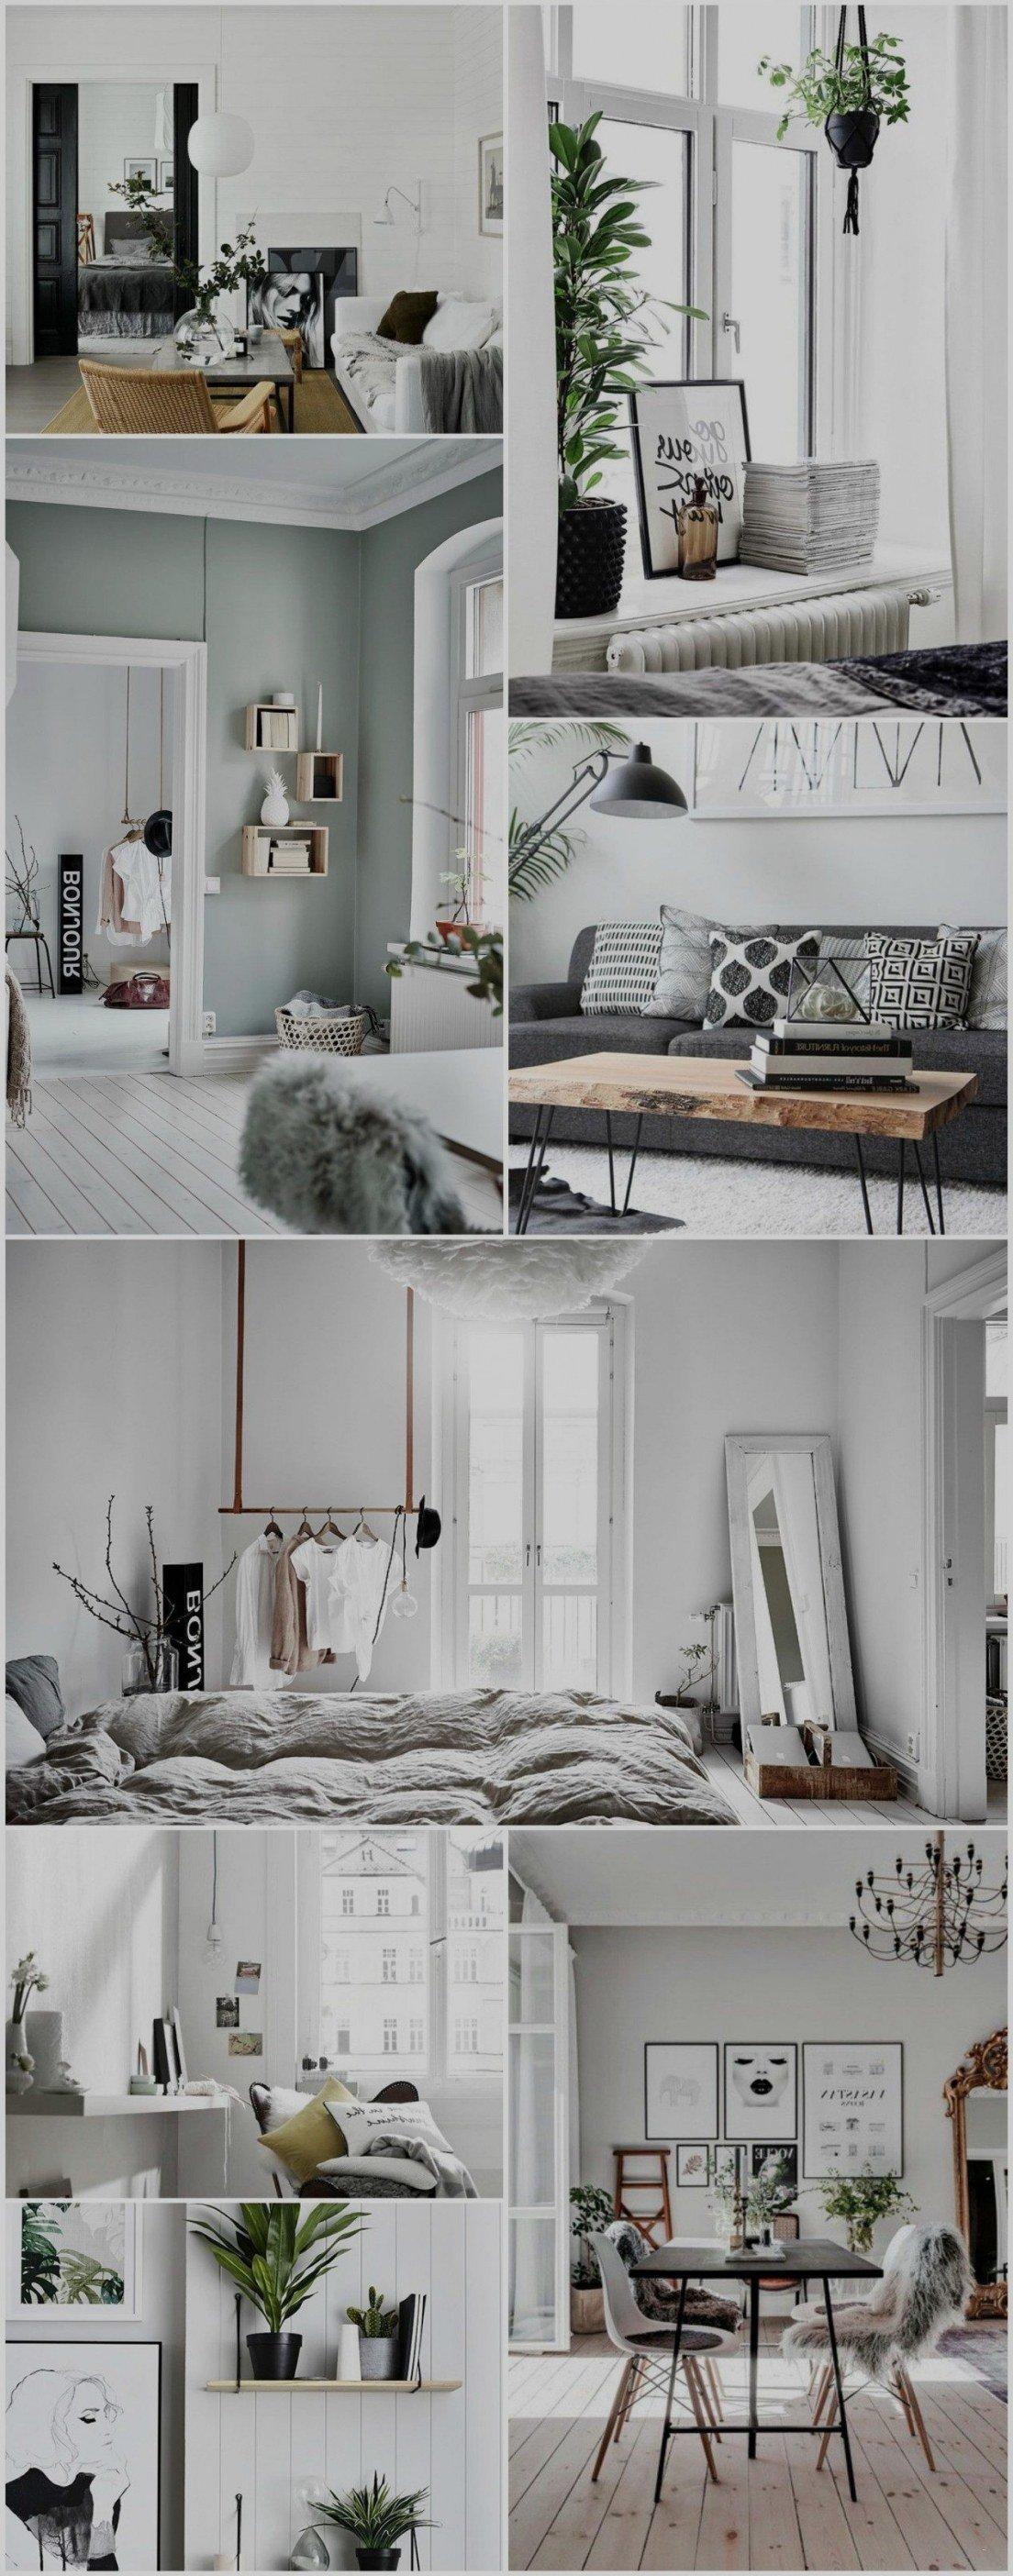 Small Bedroom Storage Ideas Unique Ikea Storage Hacks 31 Elegant Small Bedroom Storage Ideas